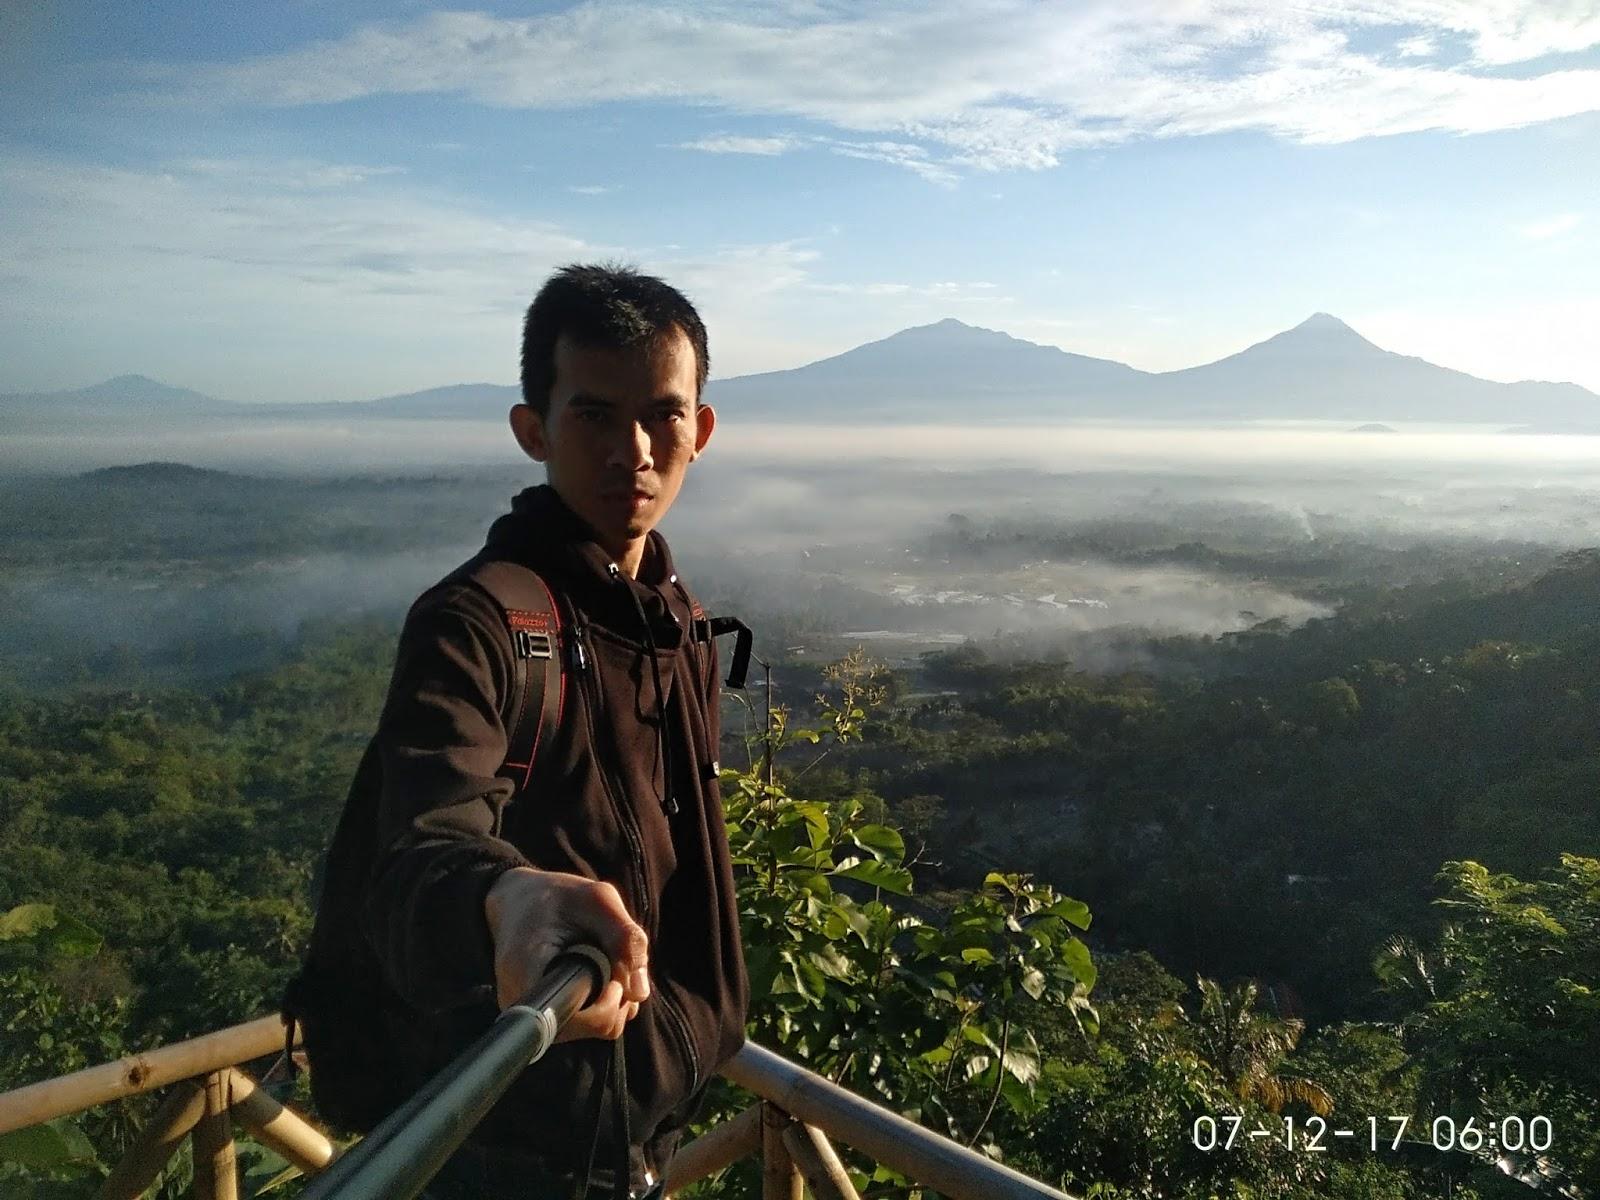 Mengejar Sunrise Punthuk Gupakan Traveling Diary Selfie Background 2 Gunung